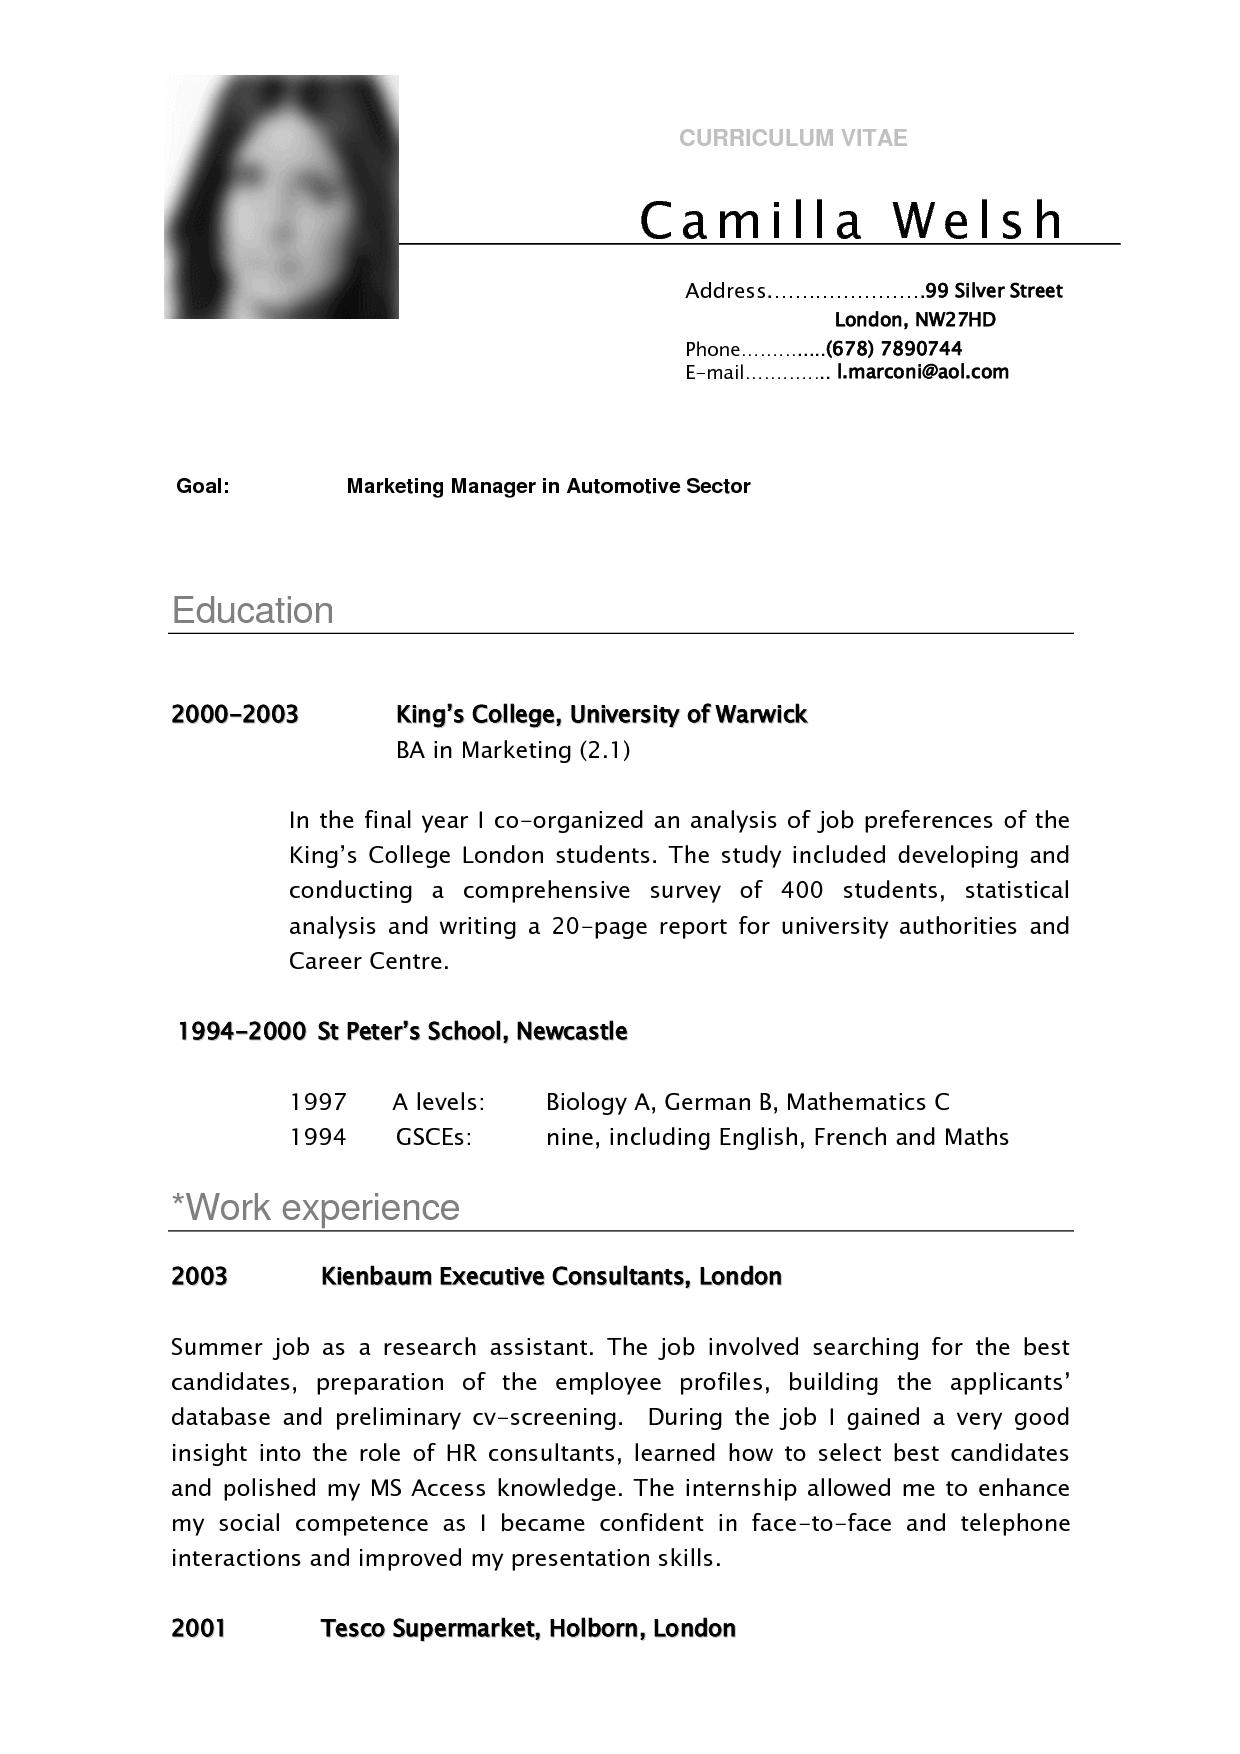 CV SAMPLE CURRICULUM VITAE Camilla Resume Pinterest